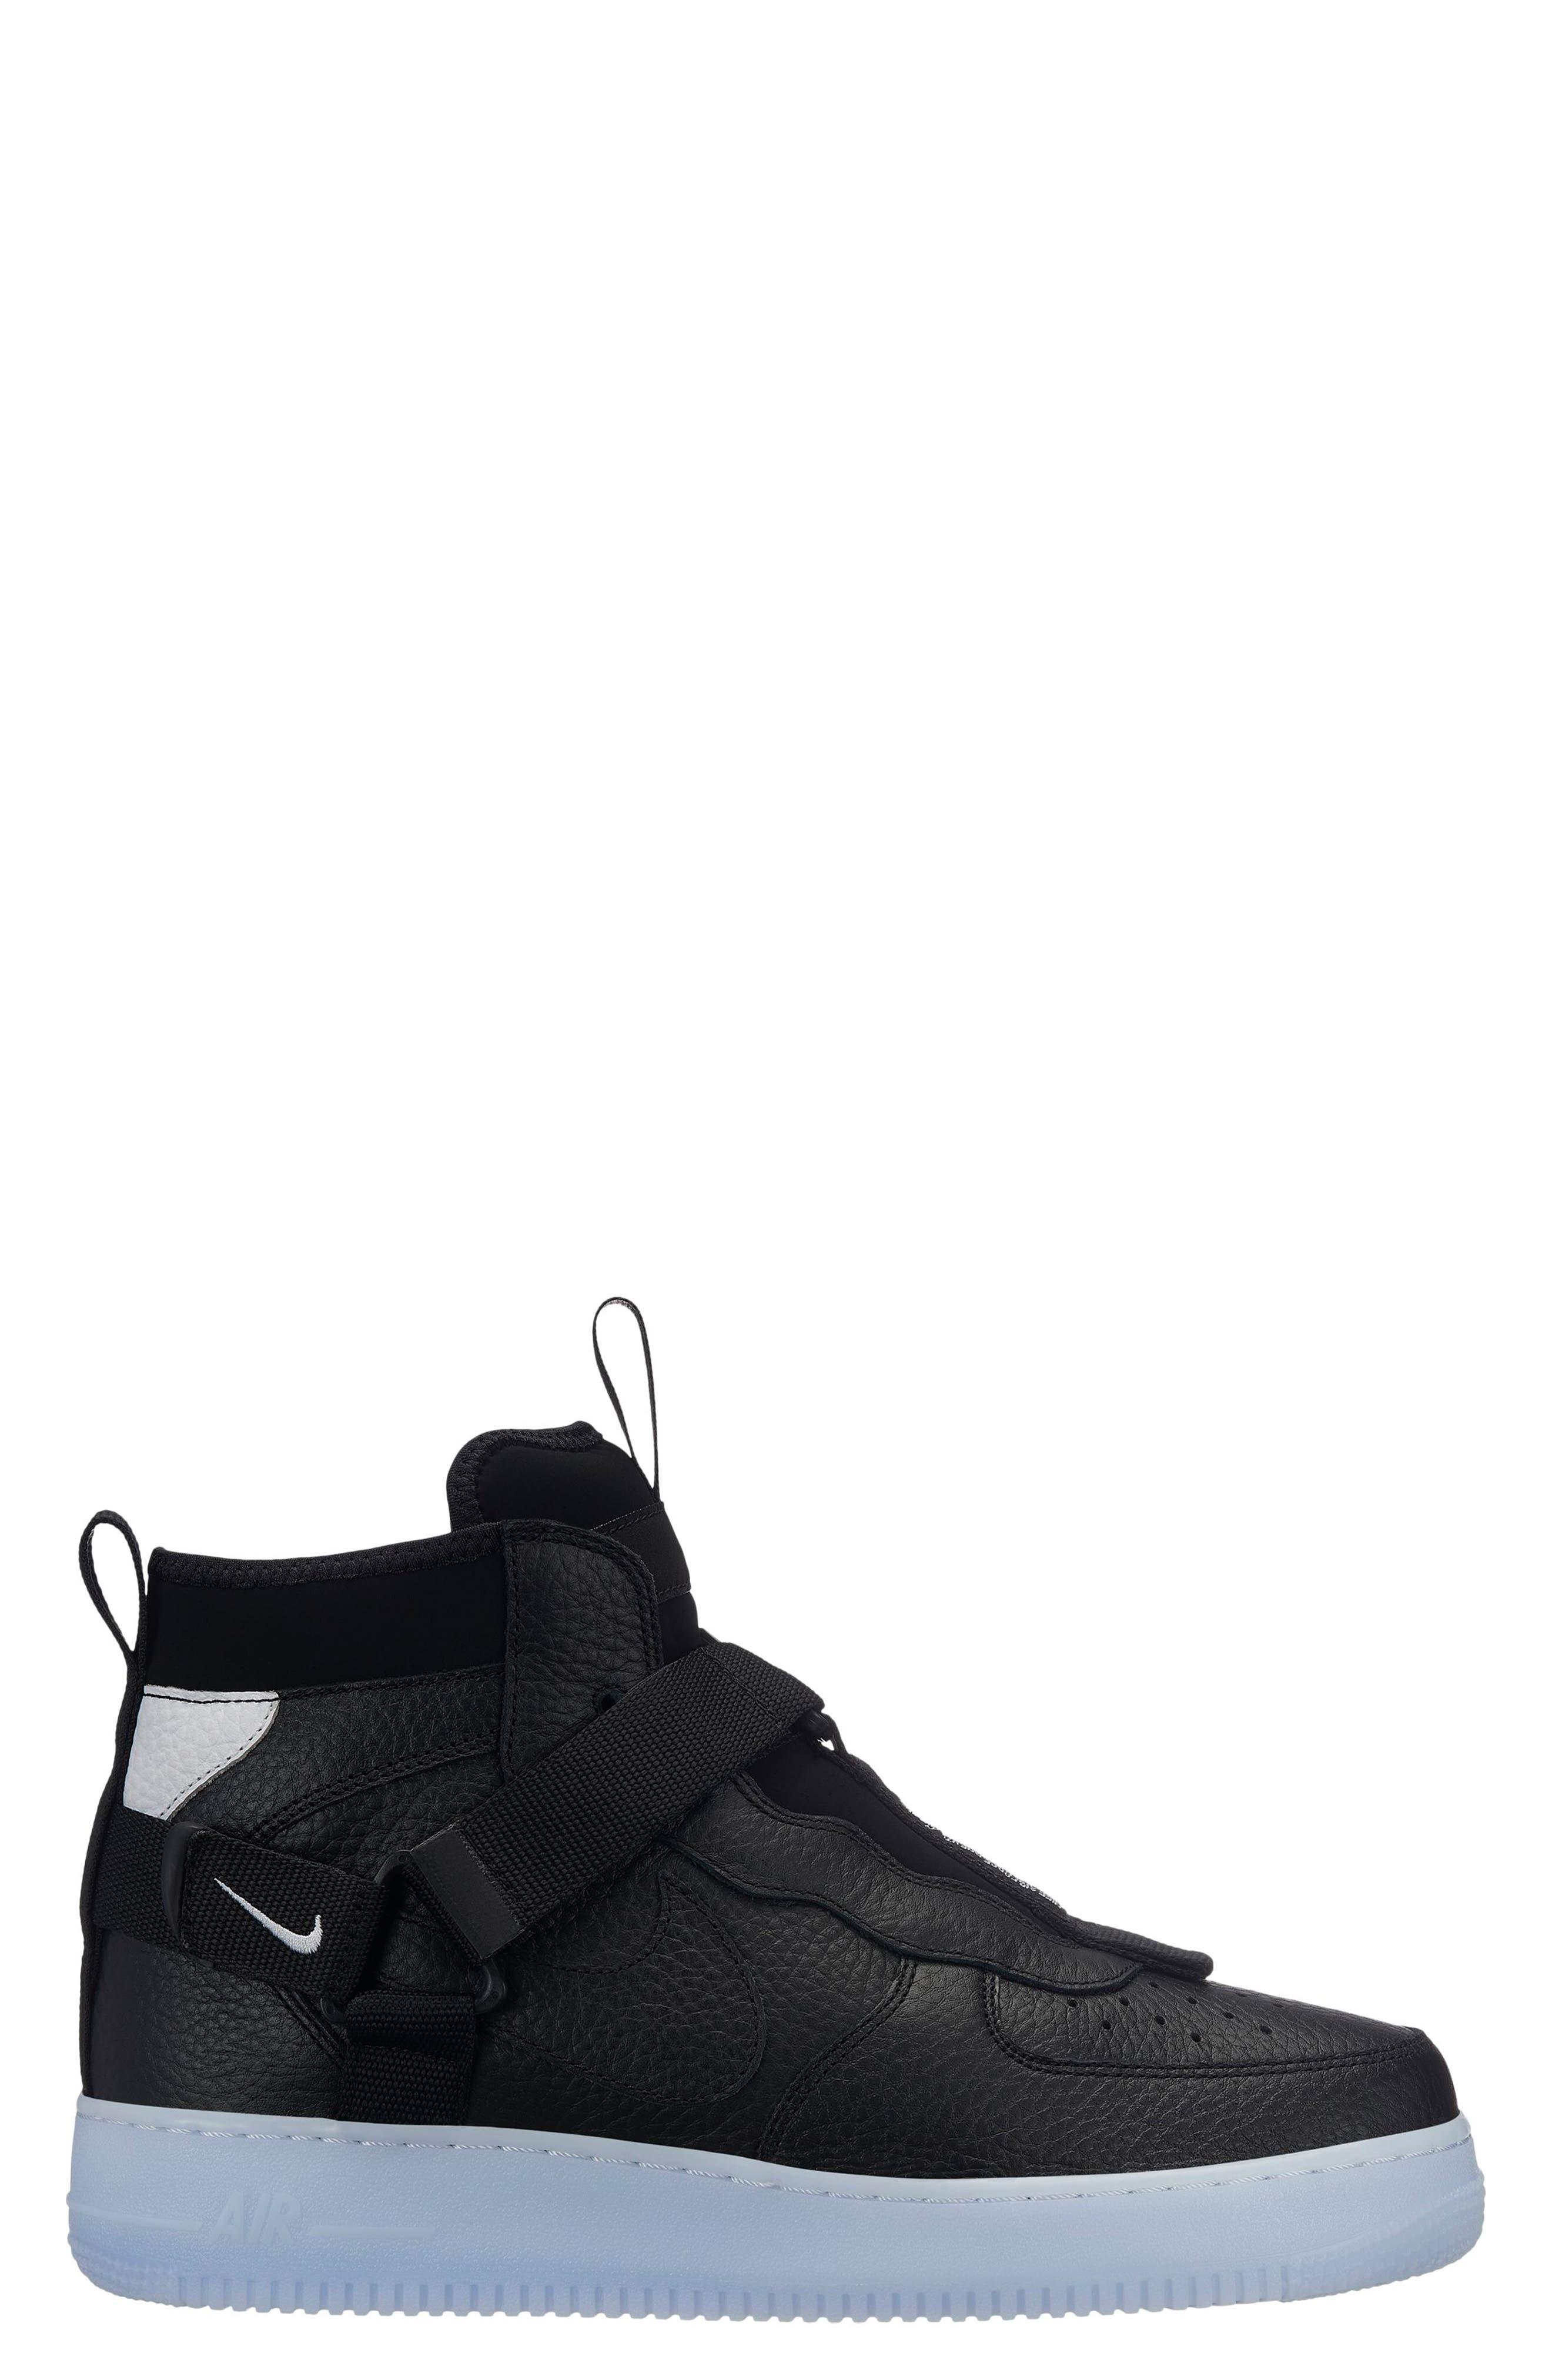 Air Force 1 Utility Mid Sneaker,                             Main thumbnail 1, color,                             BLACK/ HALF BLUE/ WHITE